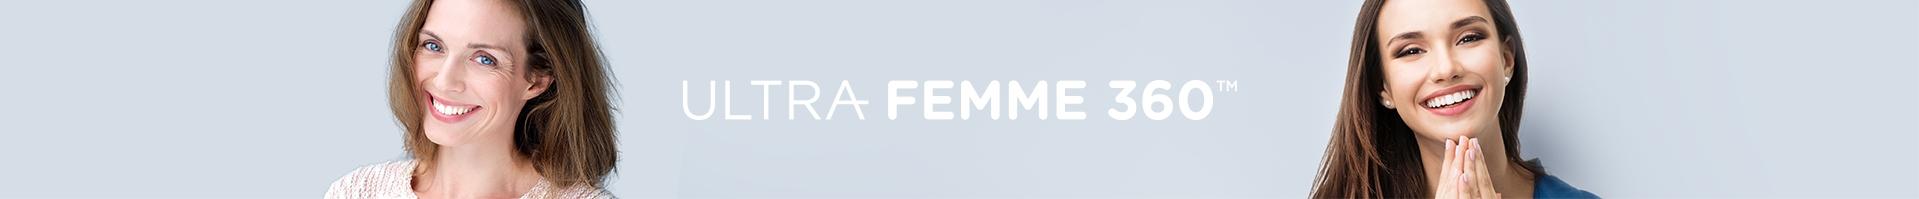 header-ultra-femme